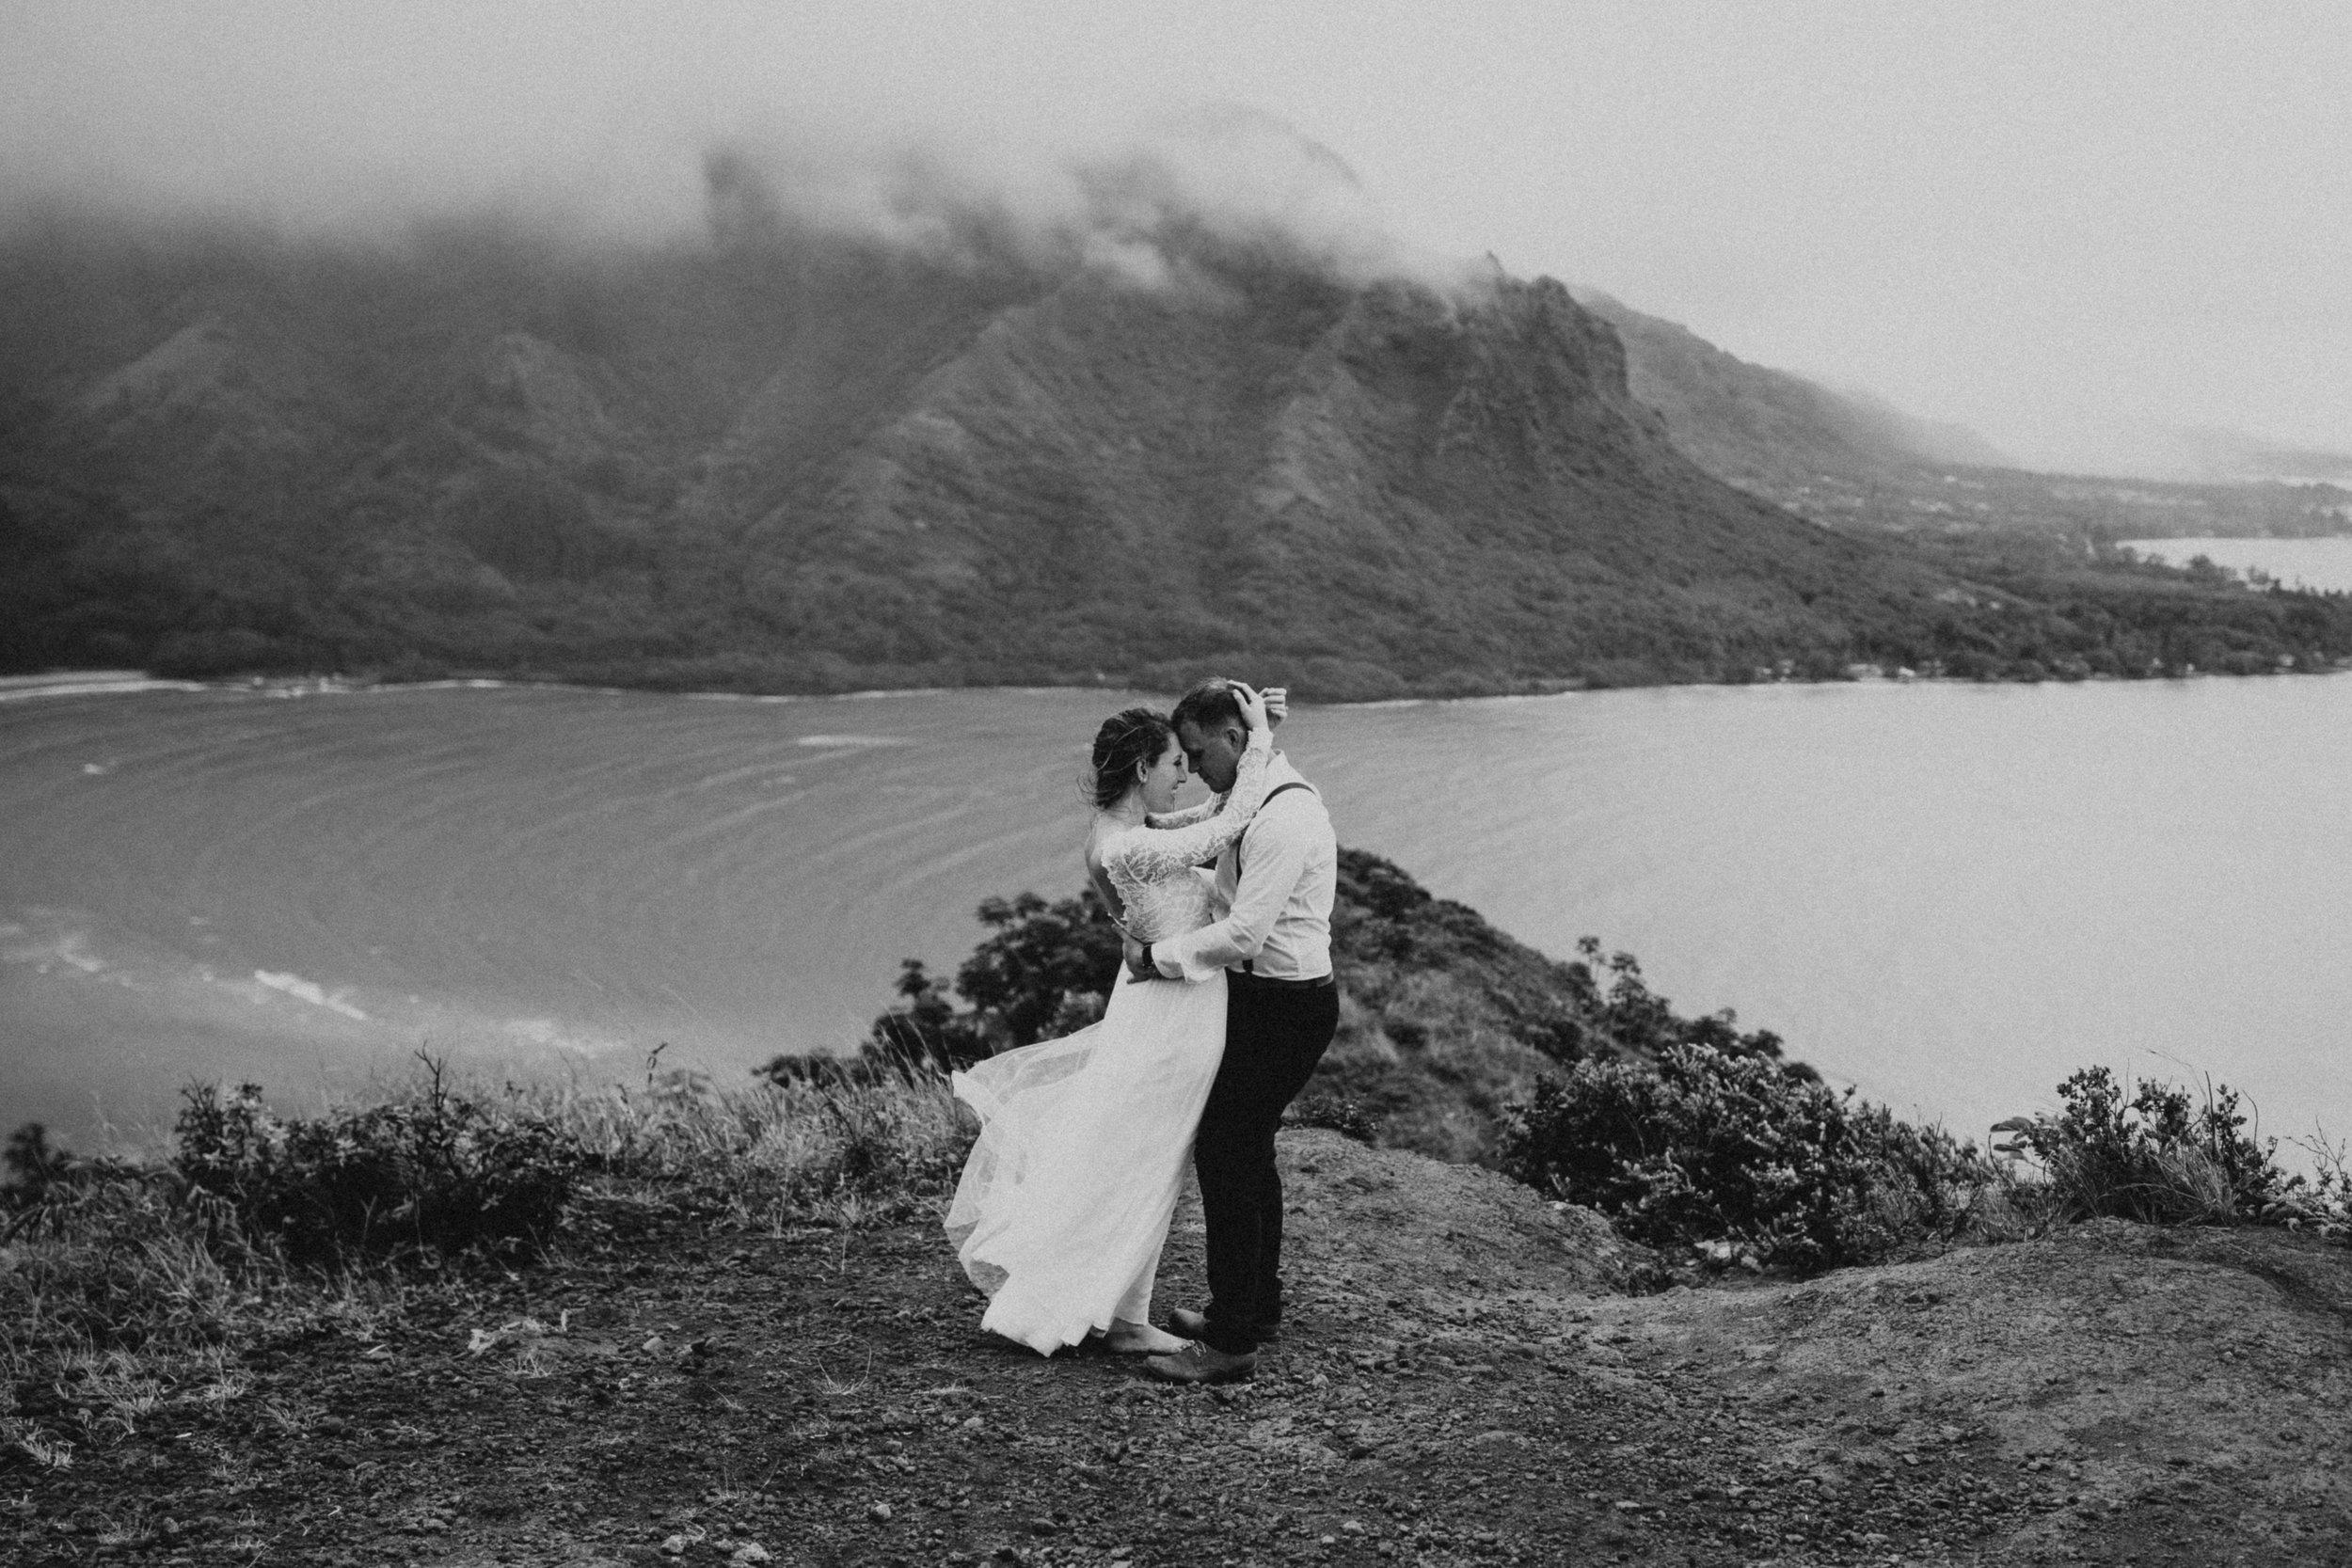 the-mclachlans-destination-elopement-photographers-mountain-hike-sena-eric-129.jpg